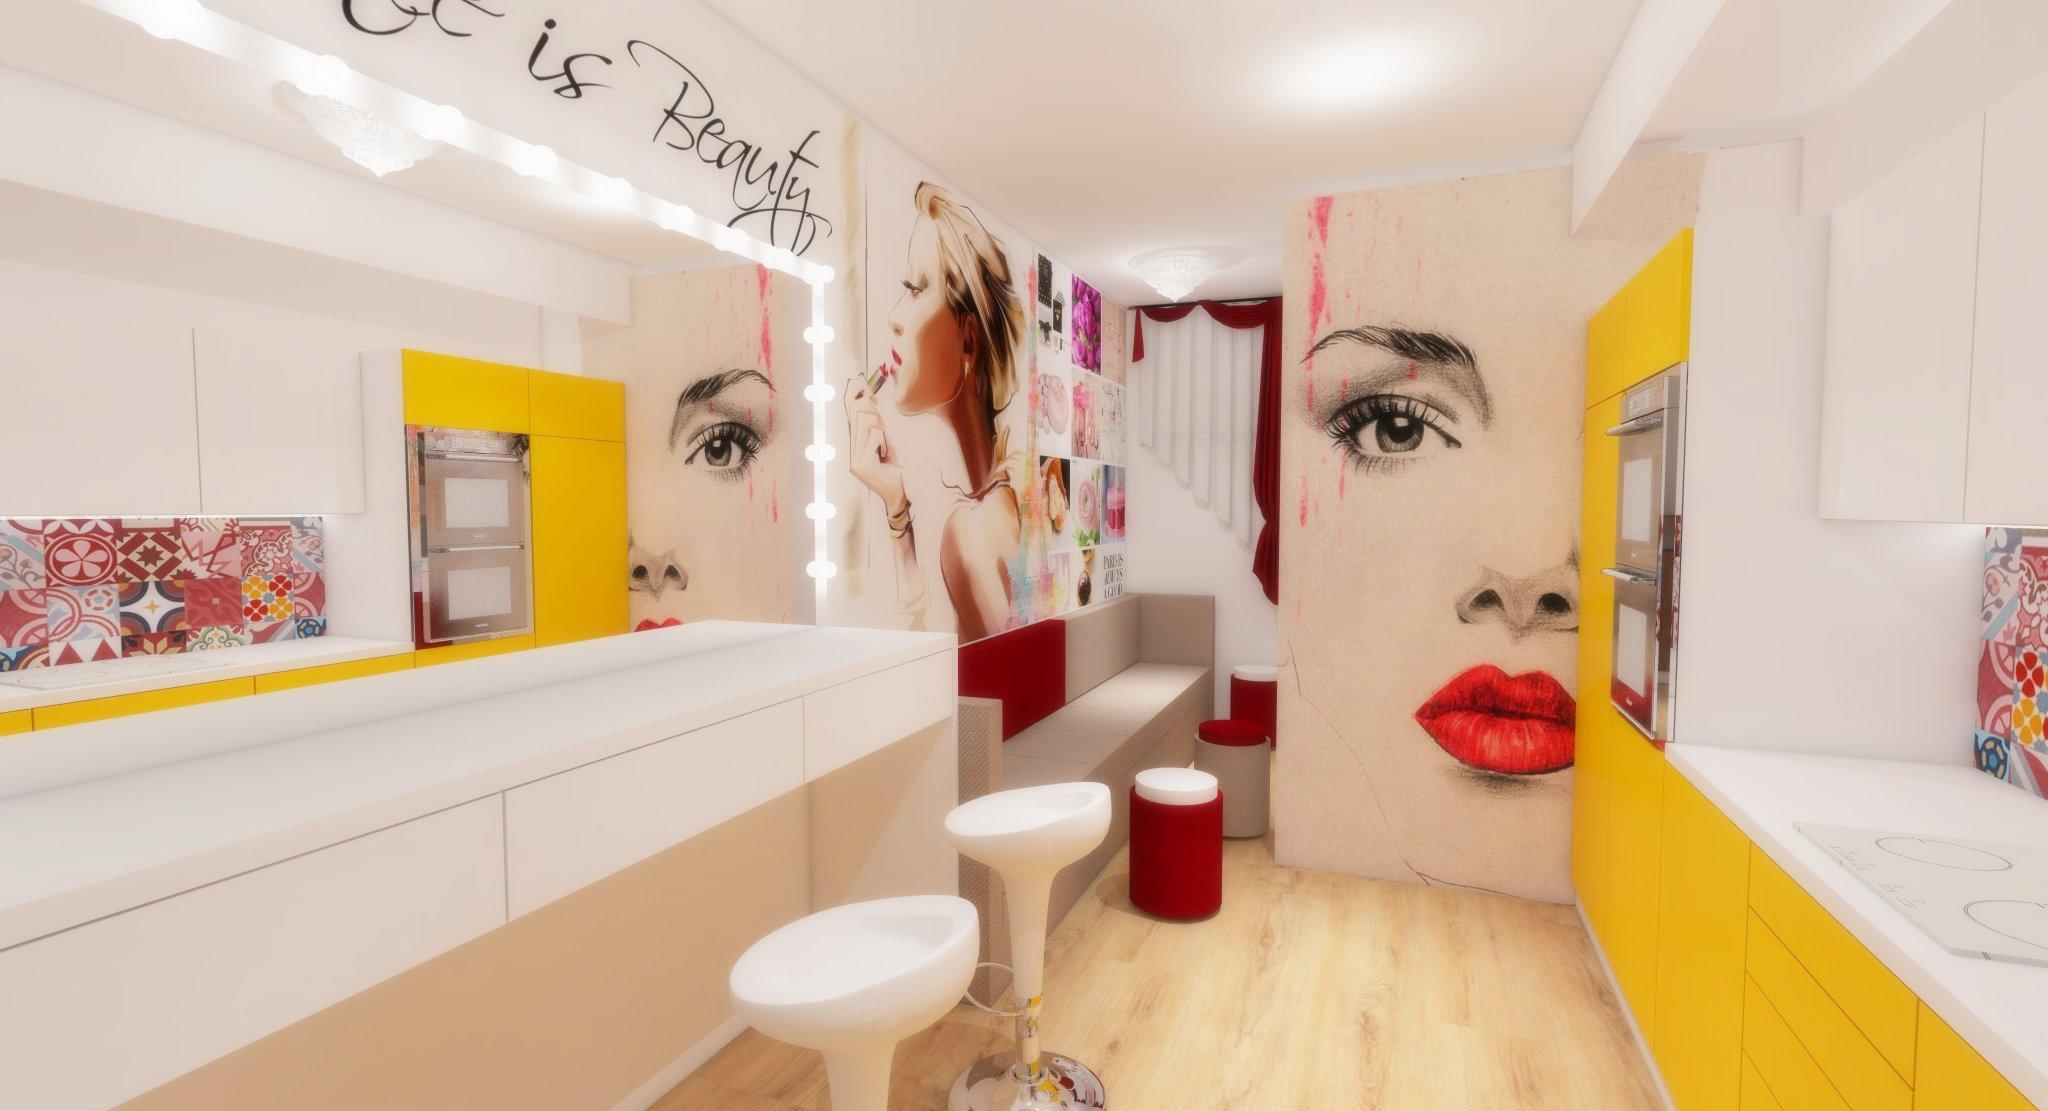 Studio 20 – Home of Glamour Models